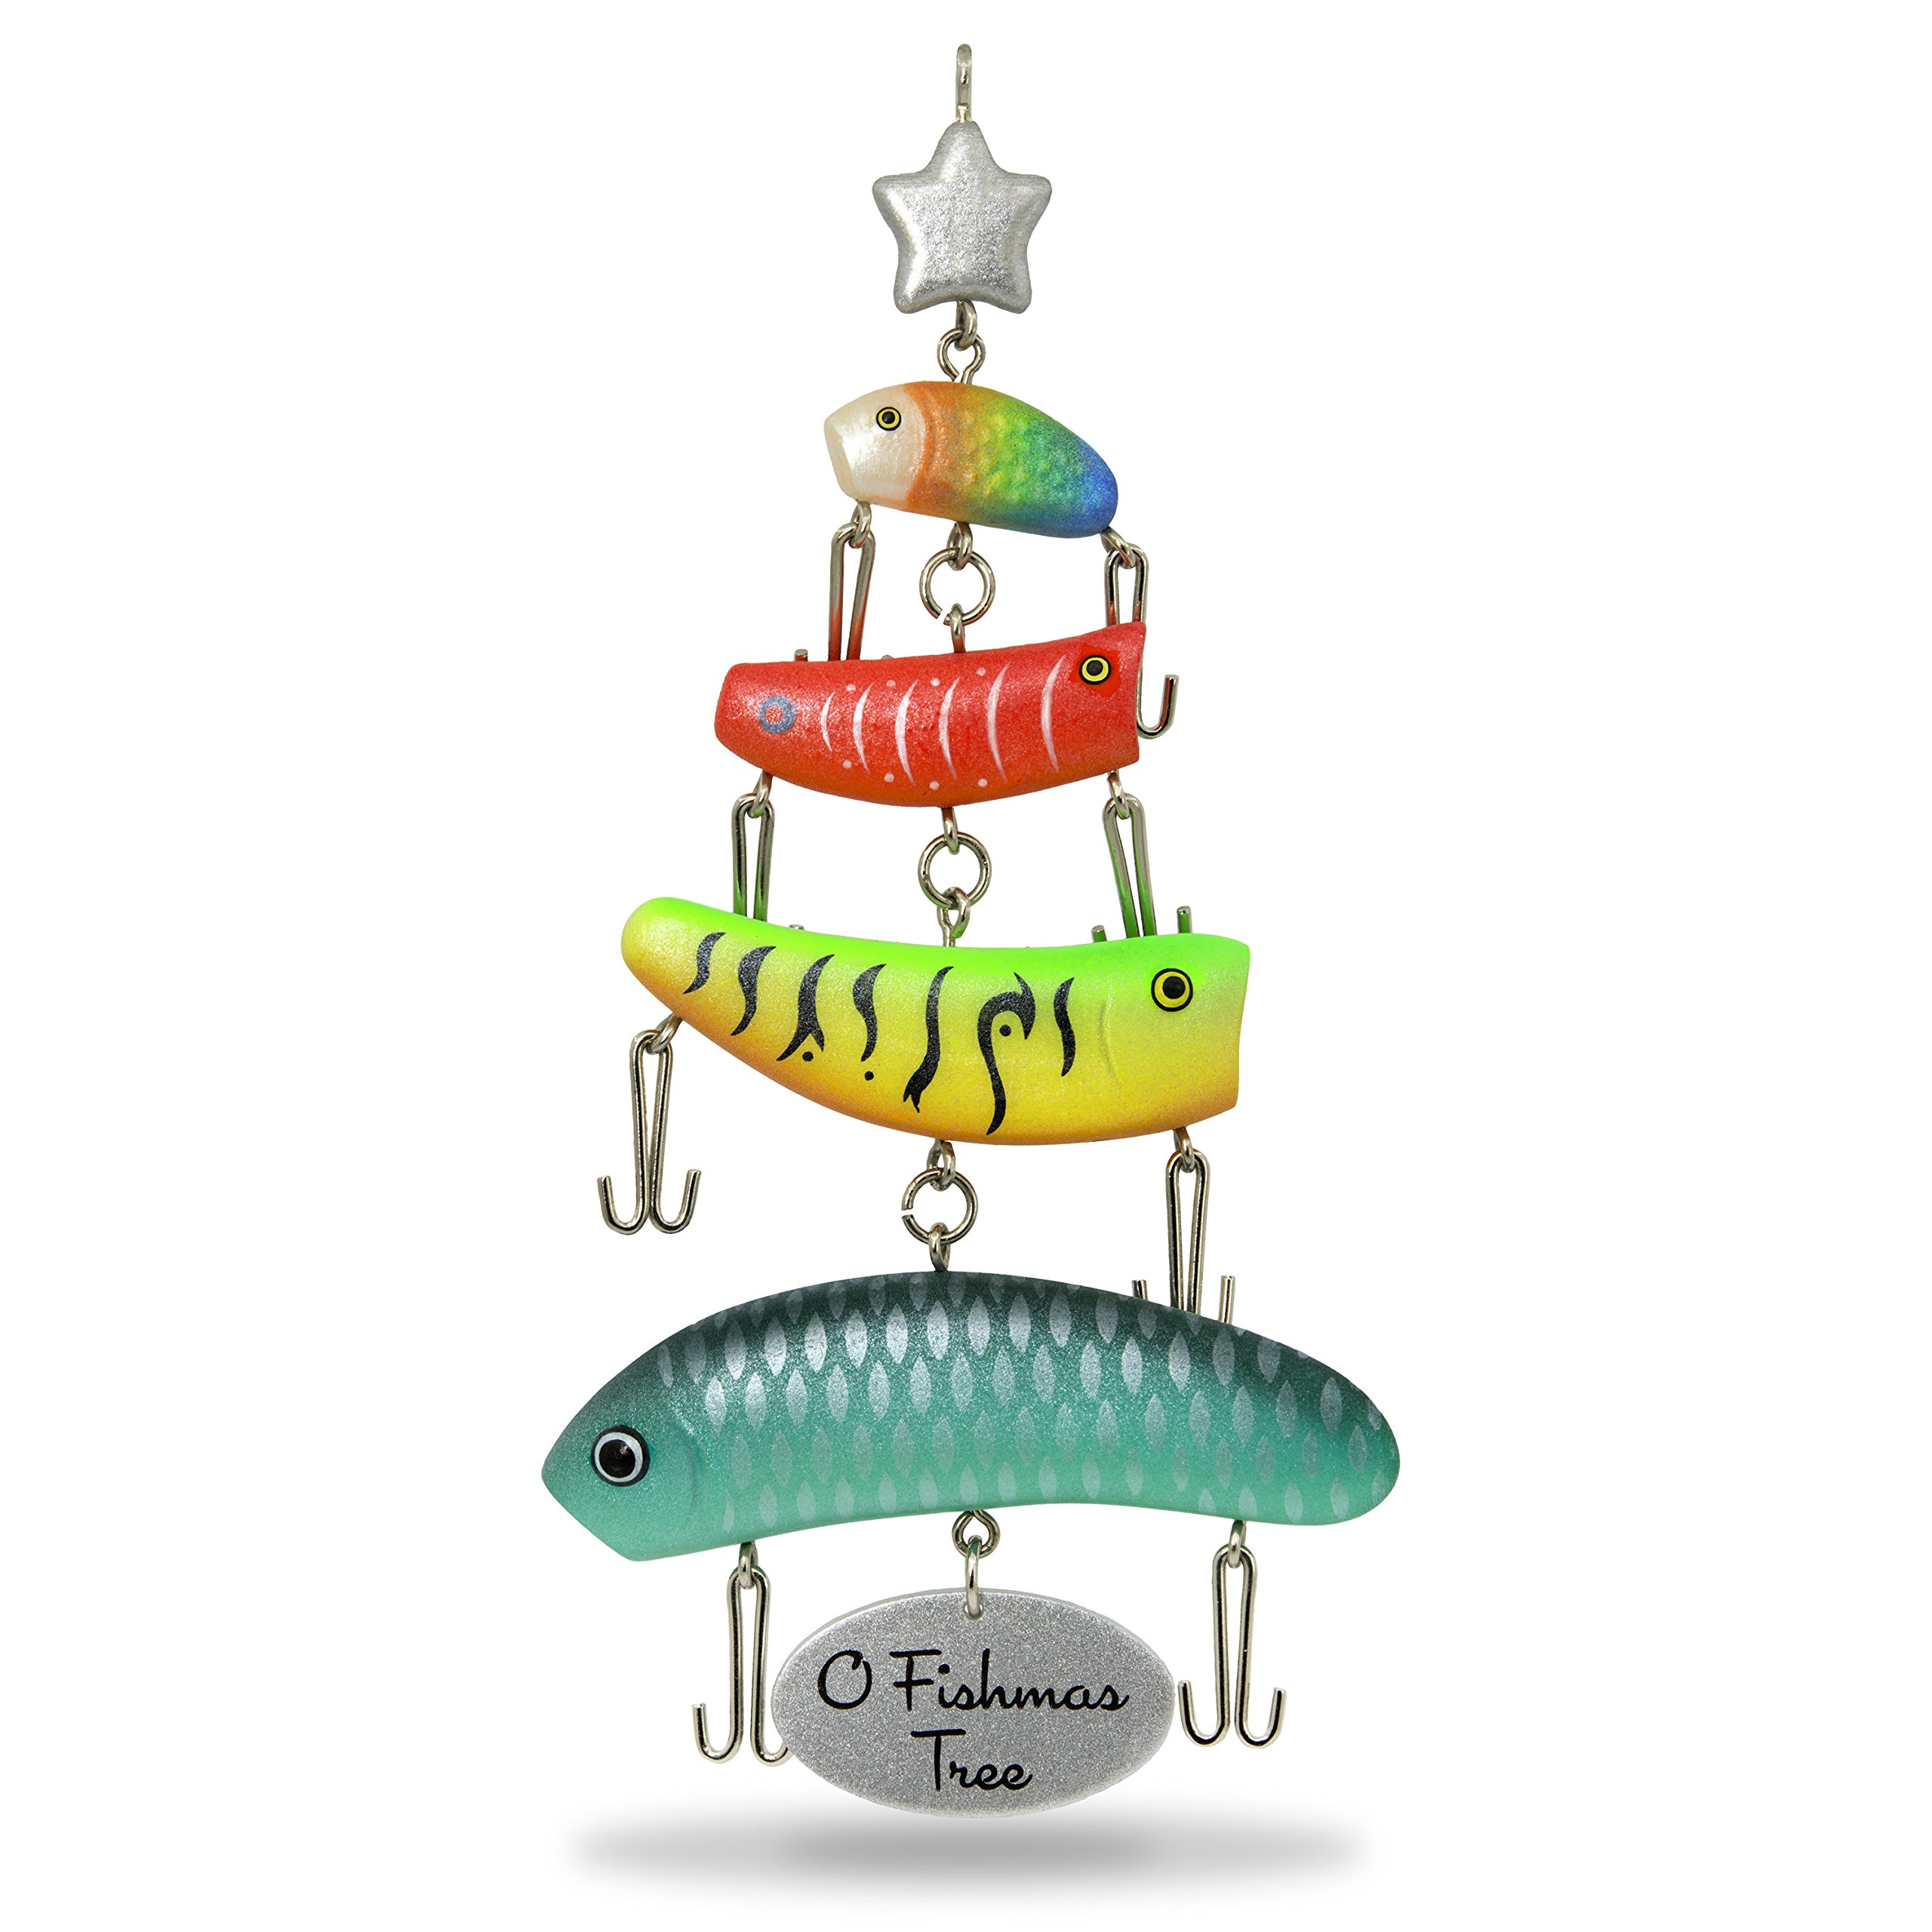 Hallmark Keepsake Christmas Ornament 2018 Year Dated: Hallmark 2018 O Fishmas Tree Christmas Ornament